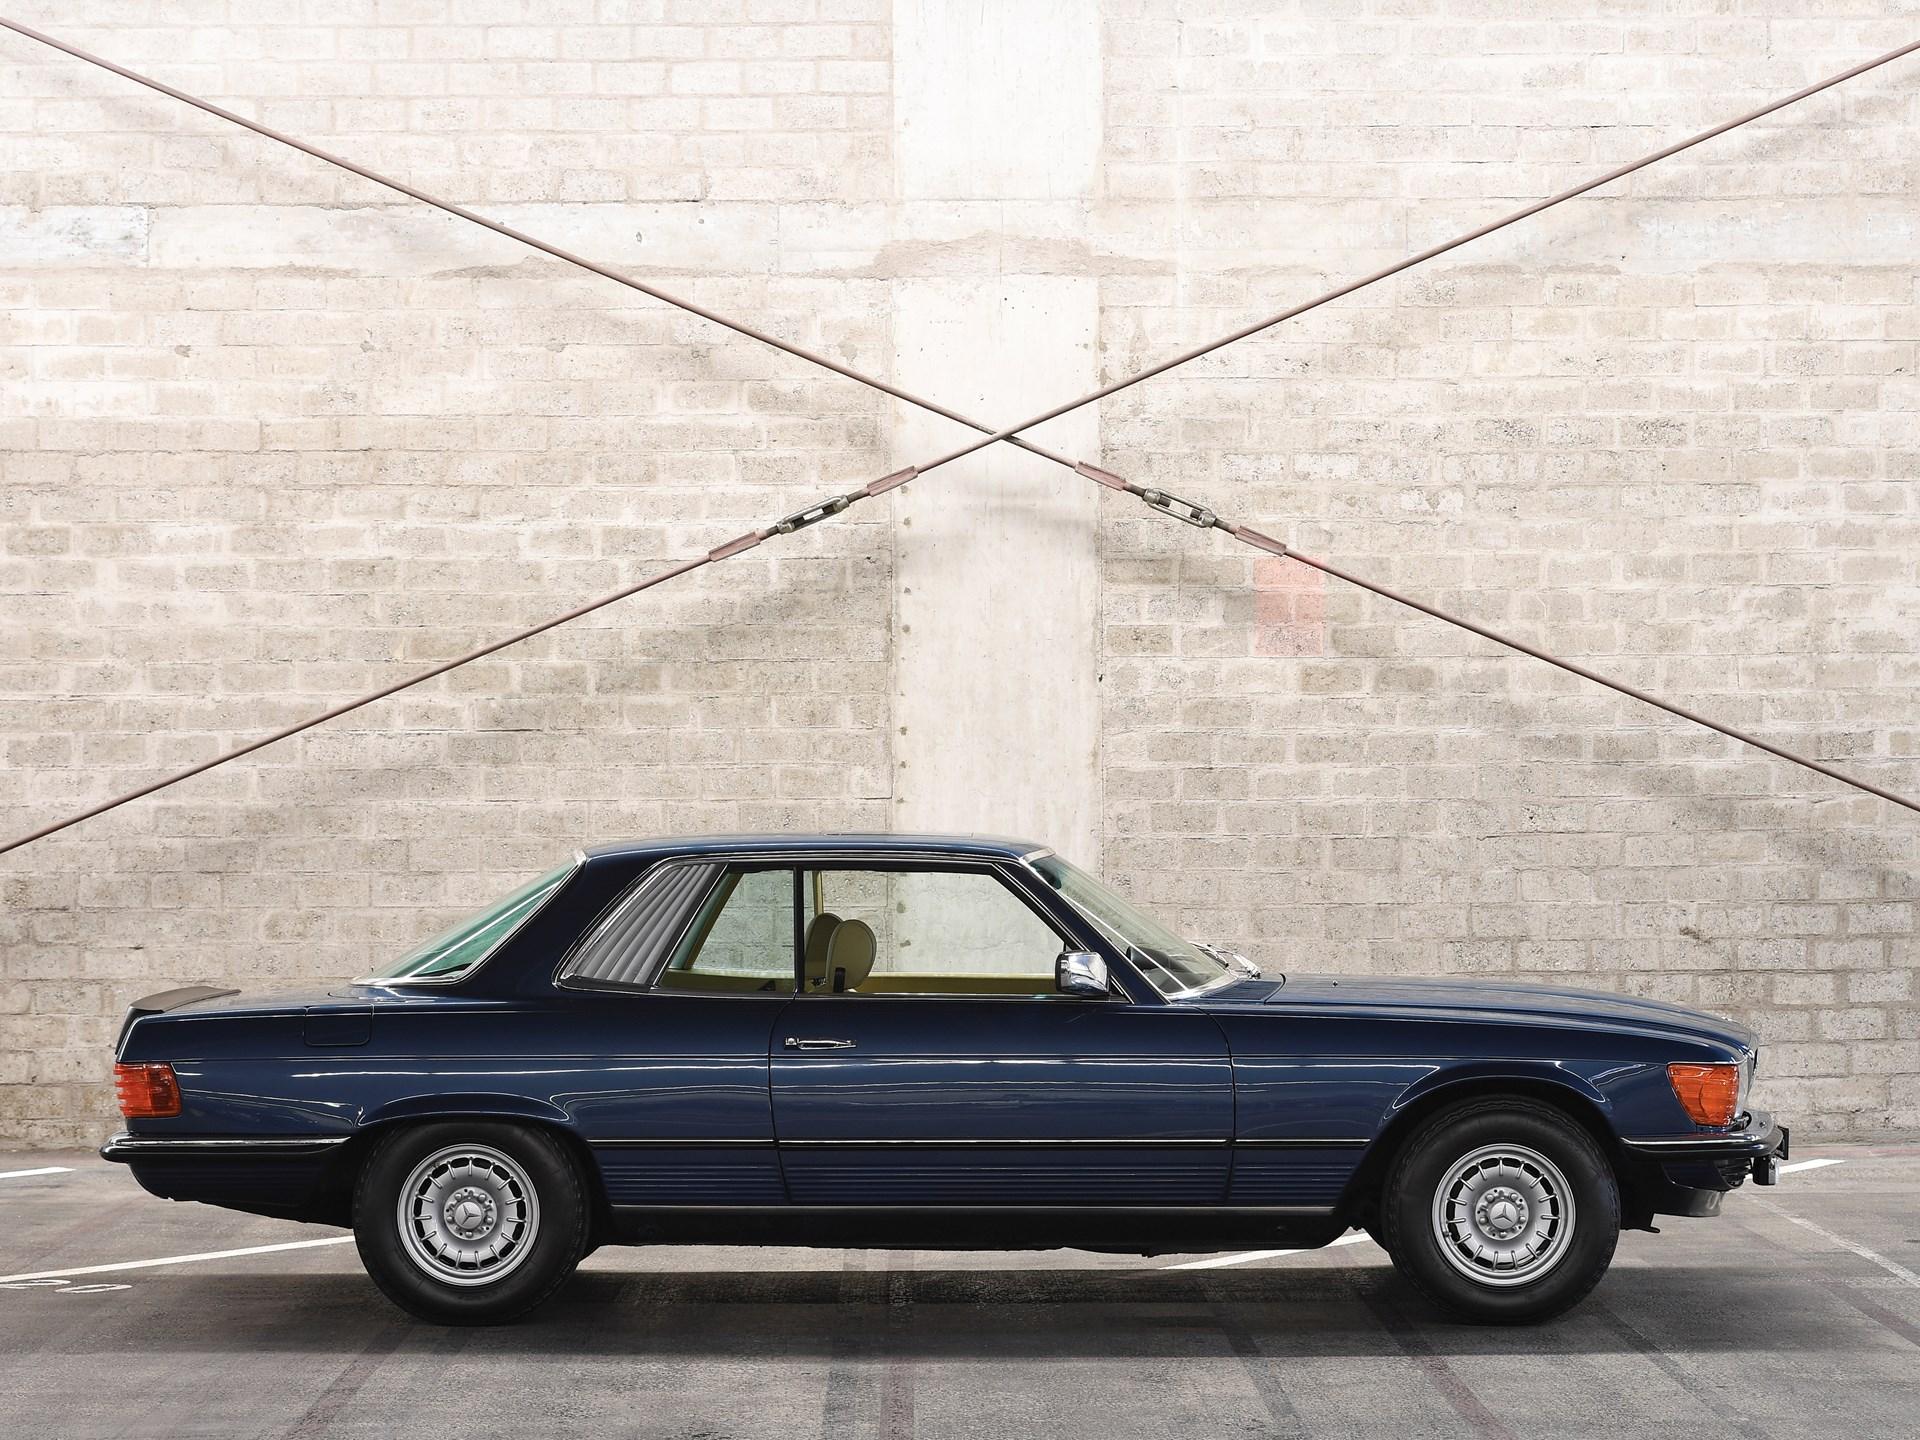 1980 Mercedes-Benz 450 SLC 5.0